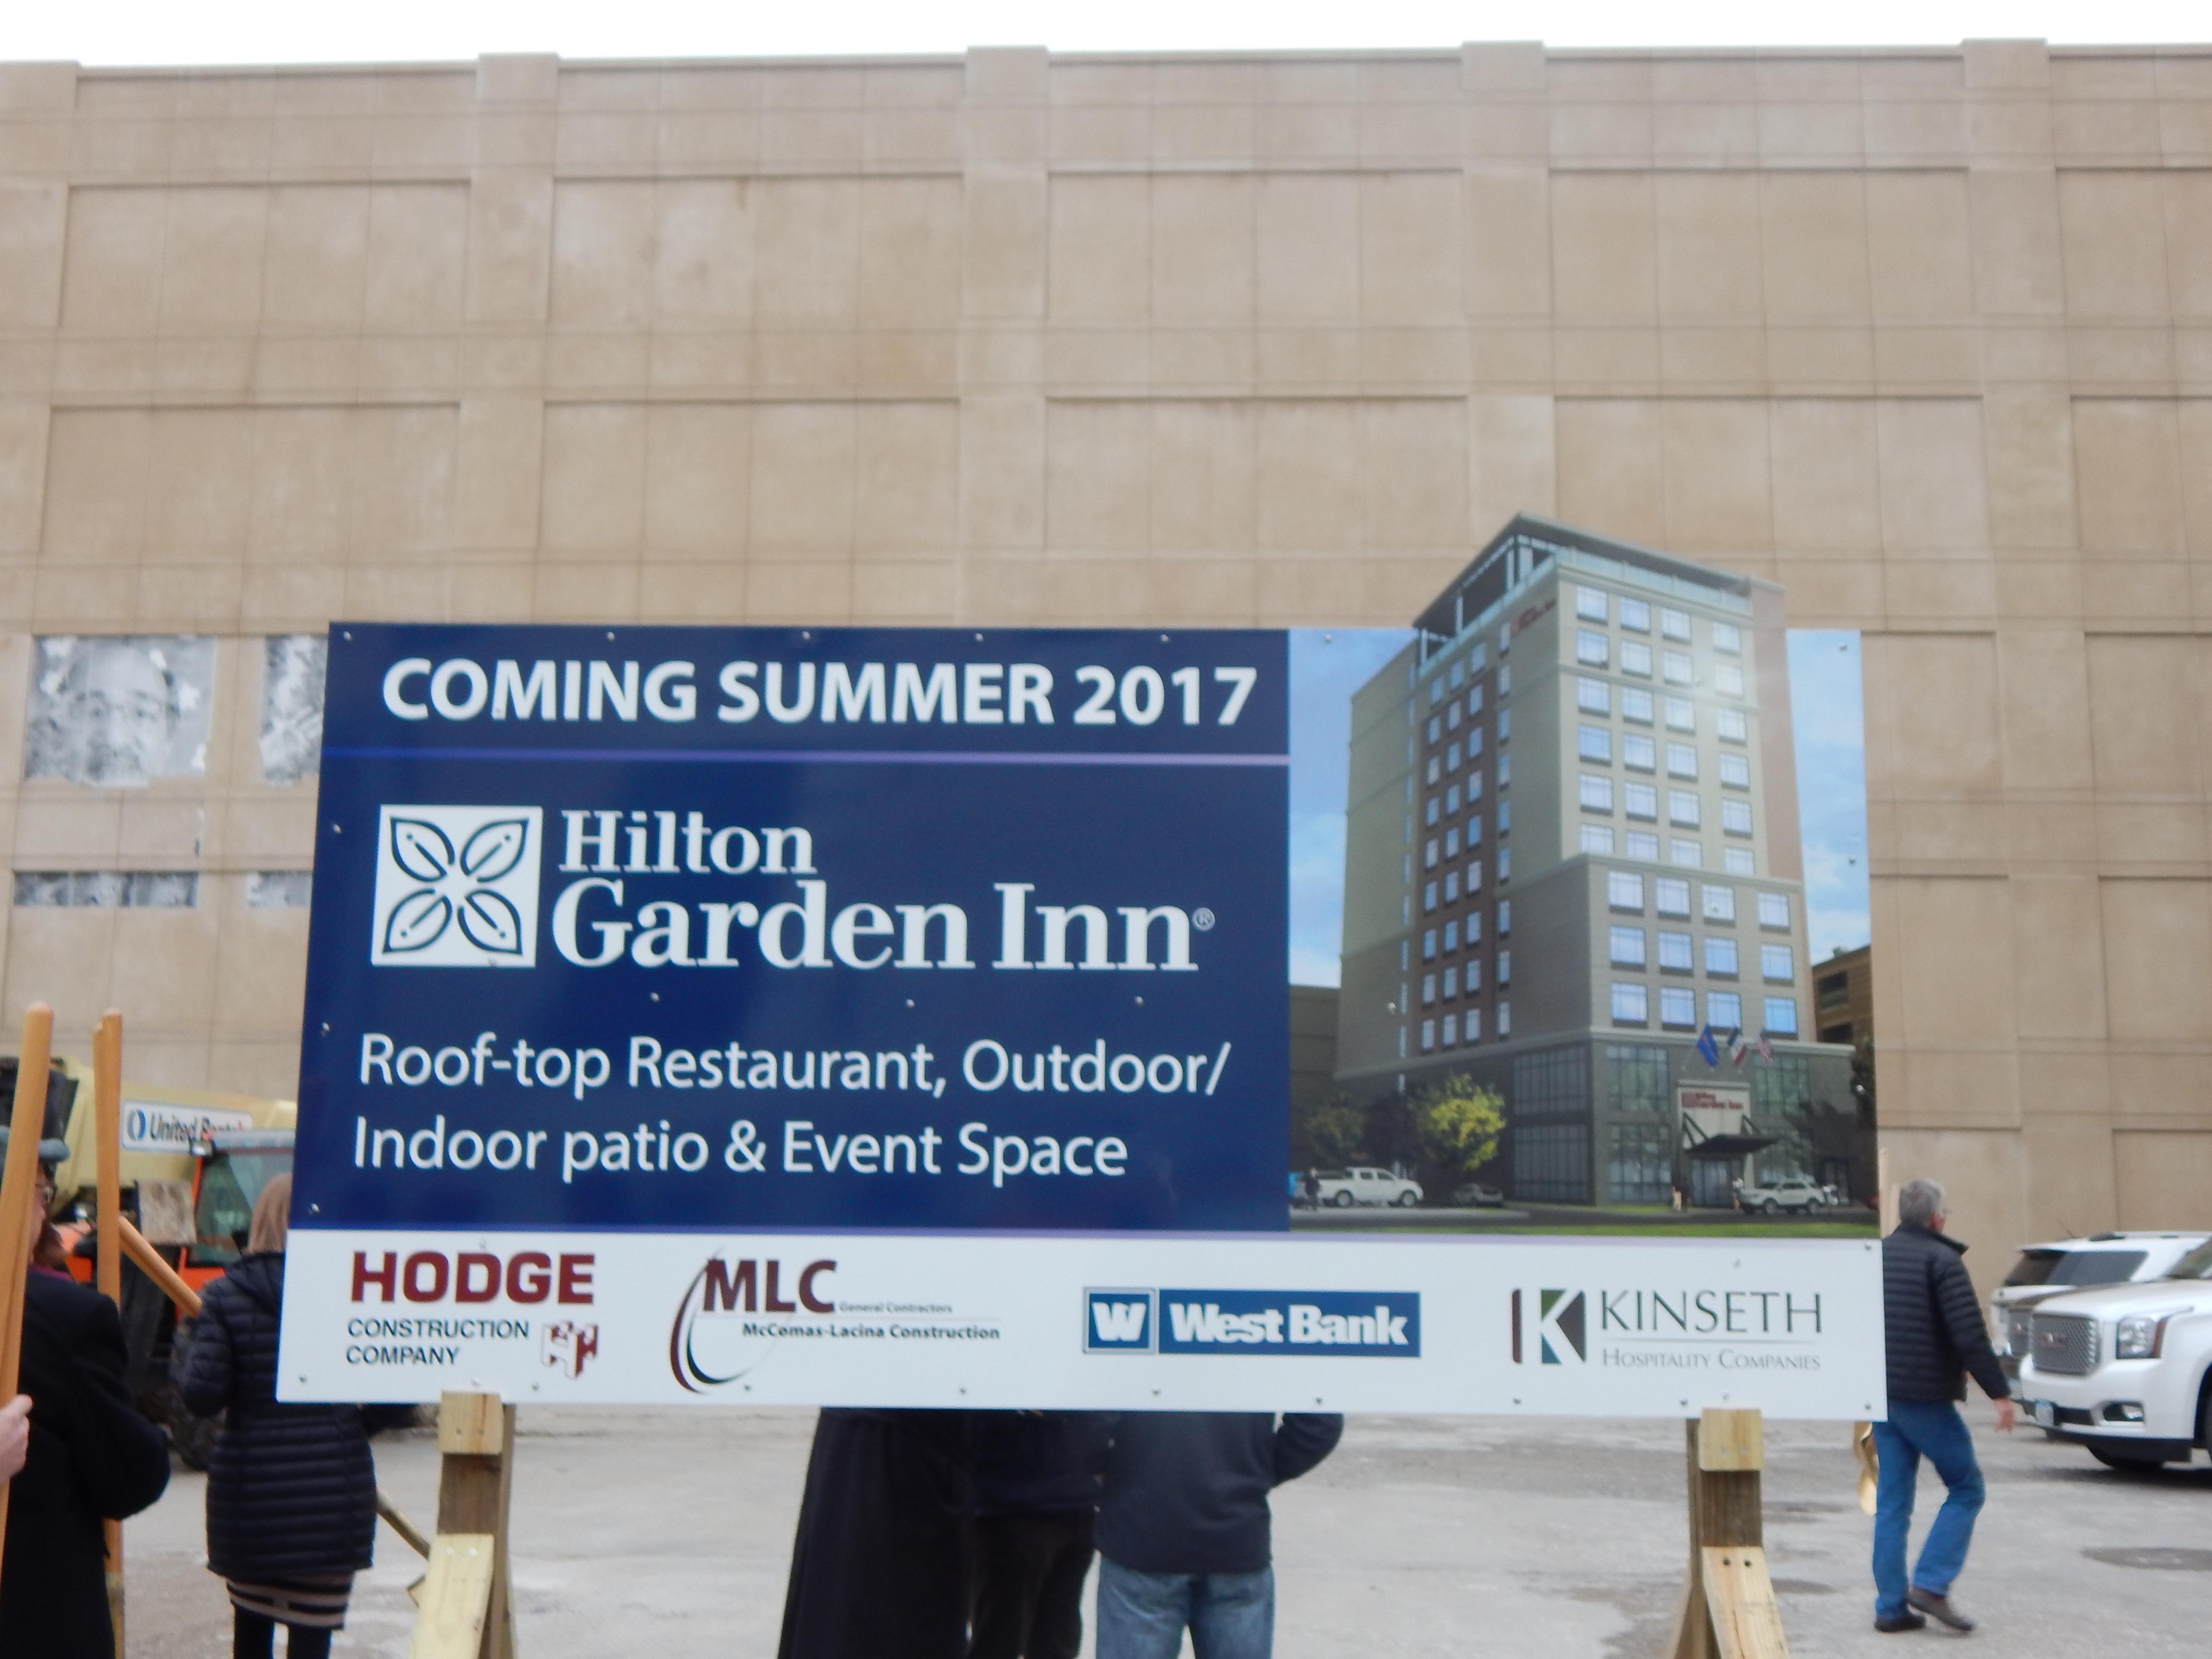 Iowa City Hotel Ociates And Kinseth Hospitality Break Ground On